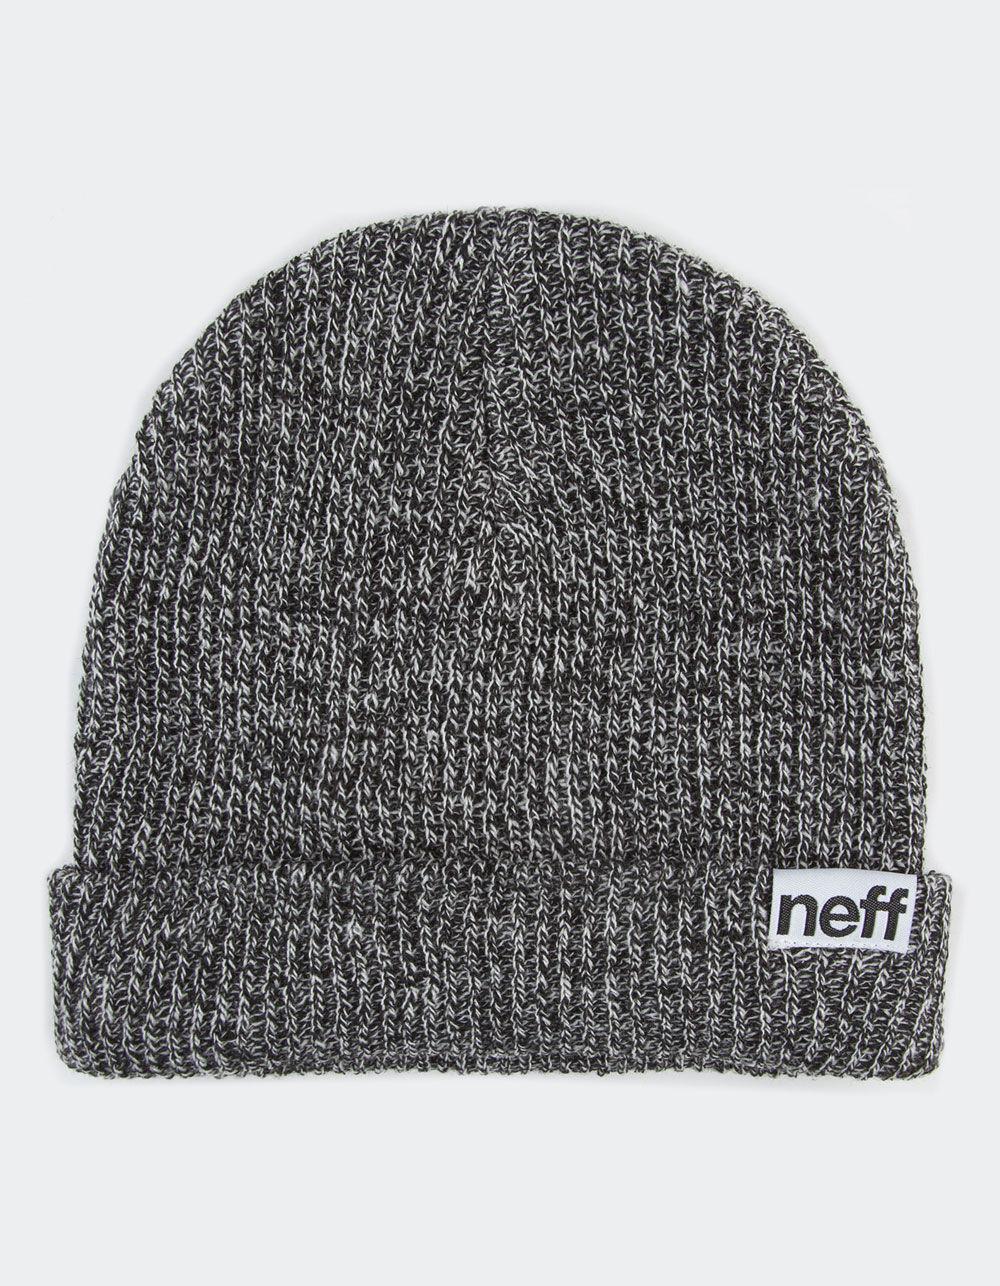 NEFF Heather Fold Beanie